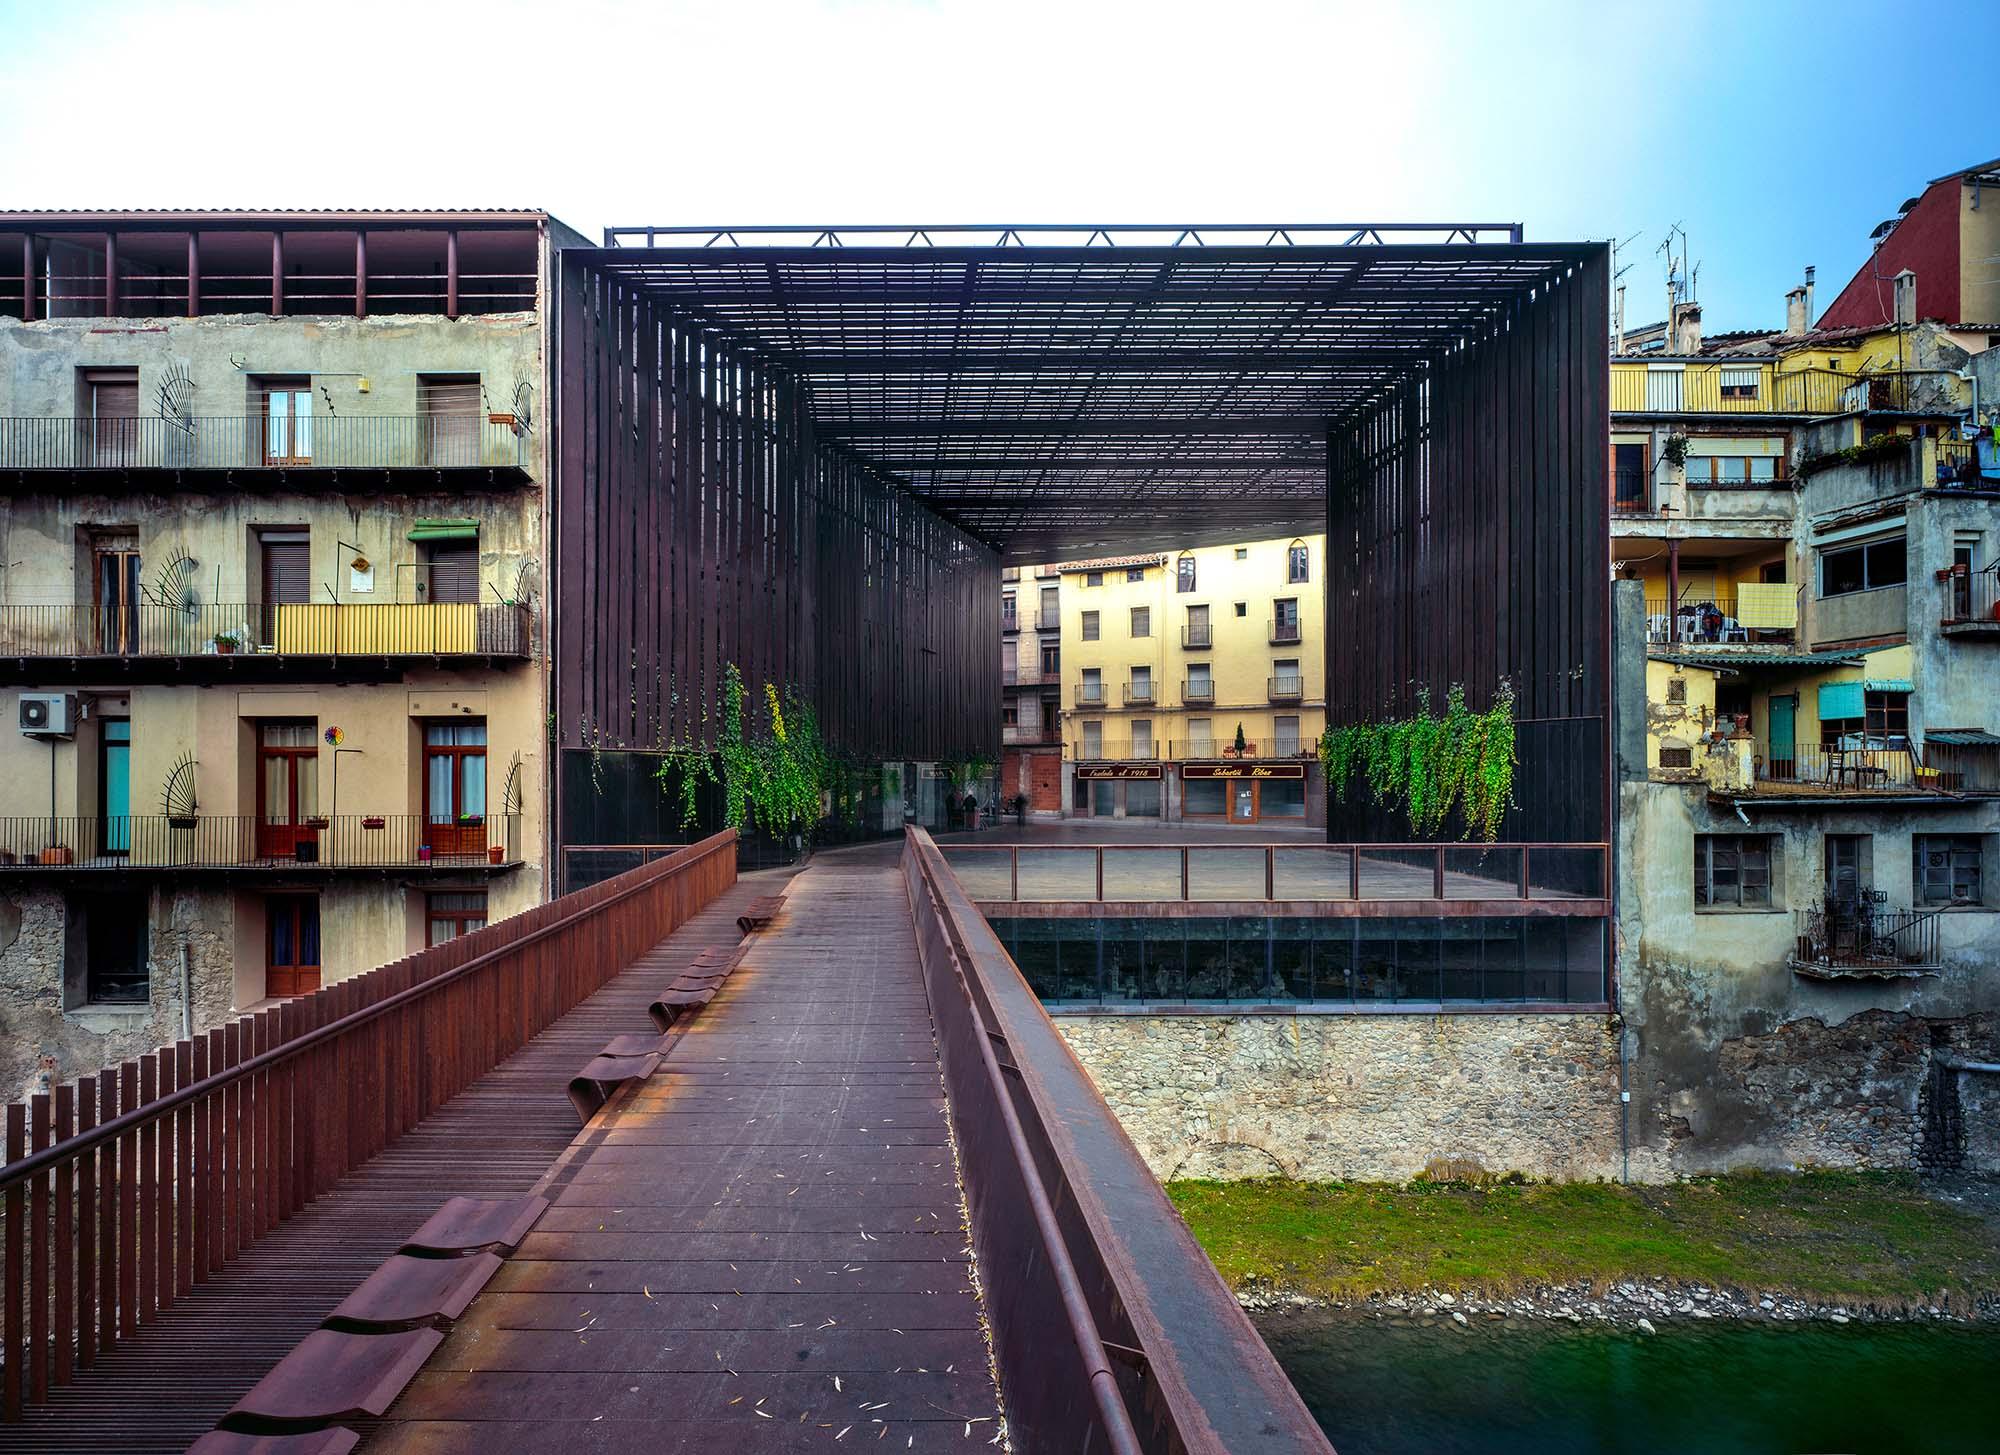 ripoll girona spain la lira theater public open space olot